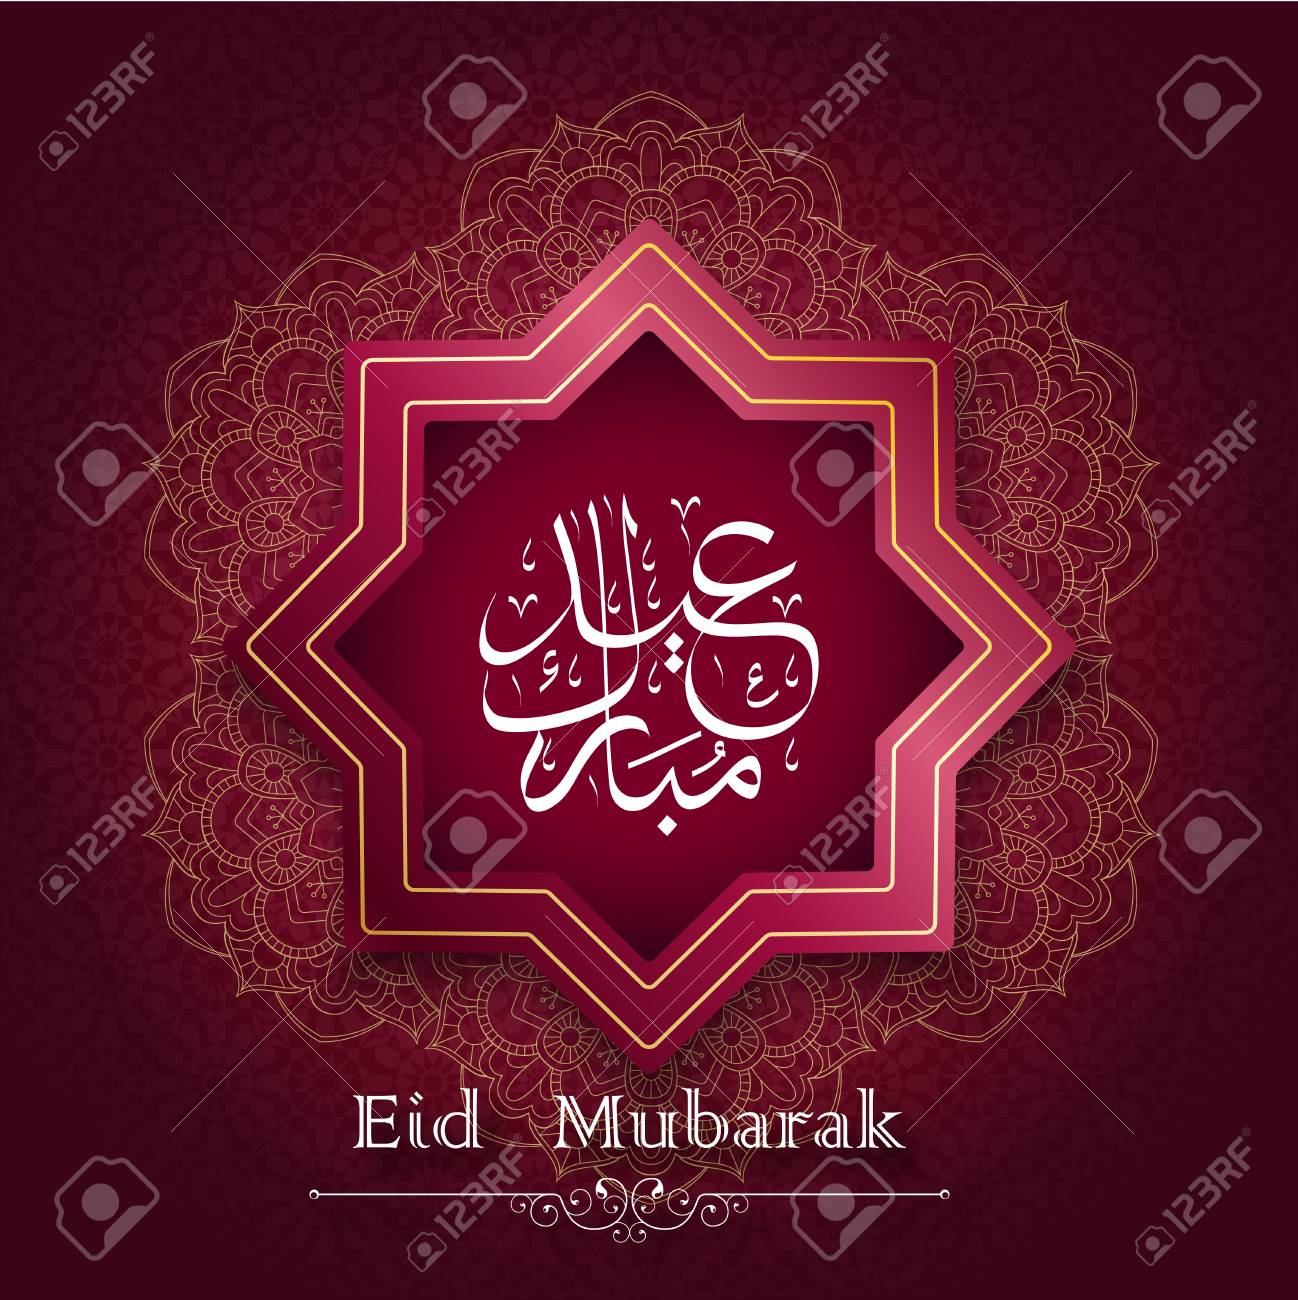 Islamic Greeting Card Eid Mubarak With Arabic Calligraphy Stock